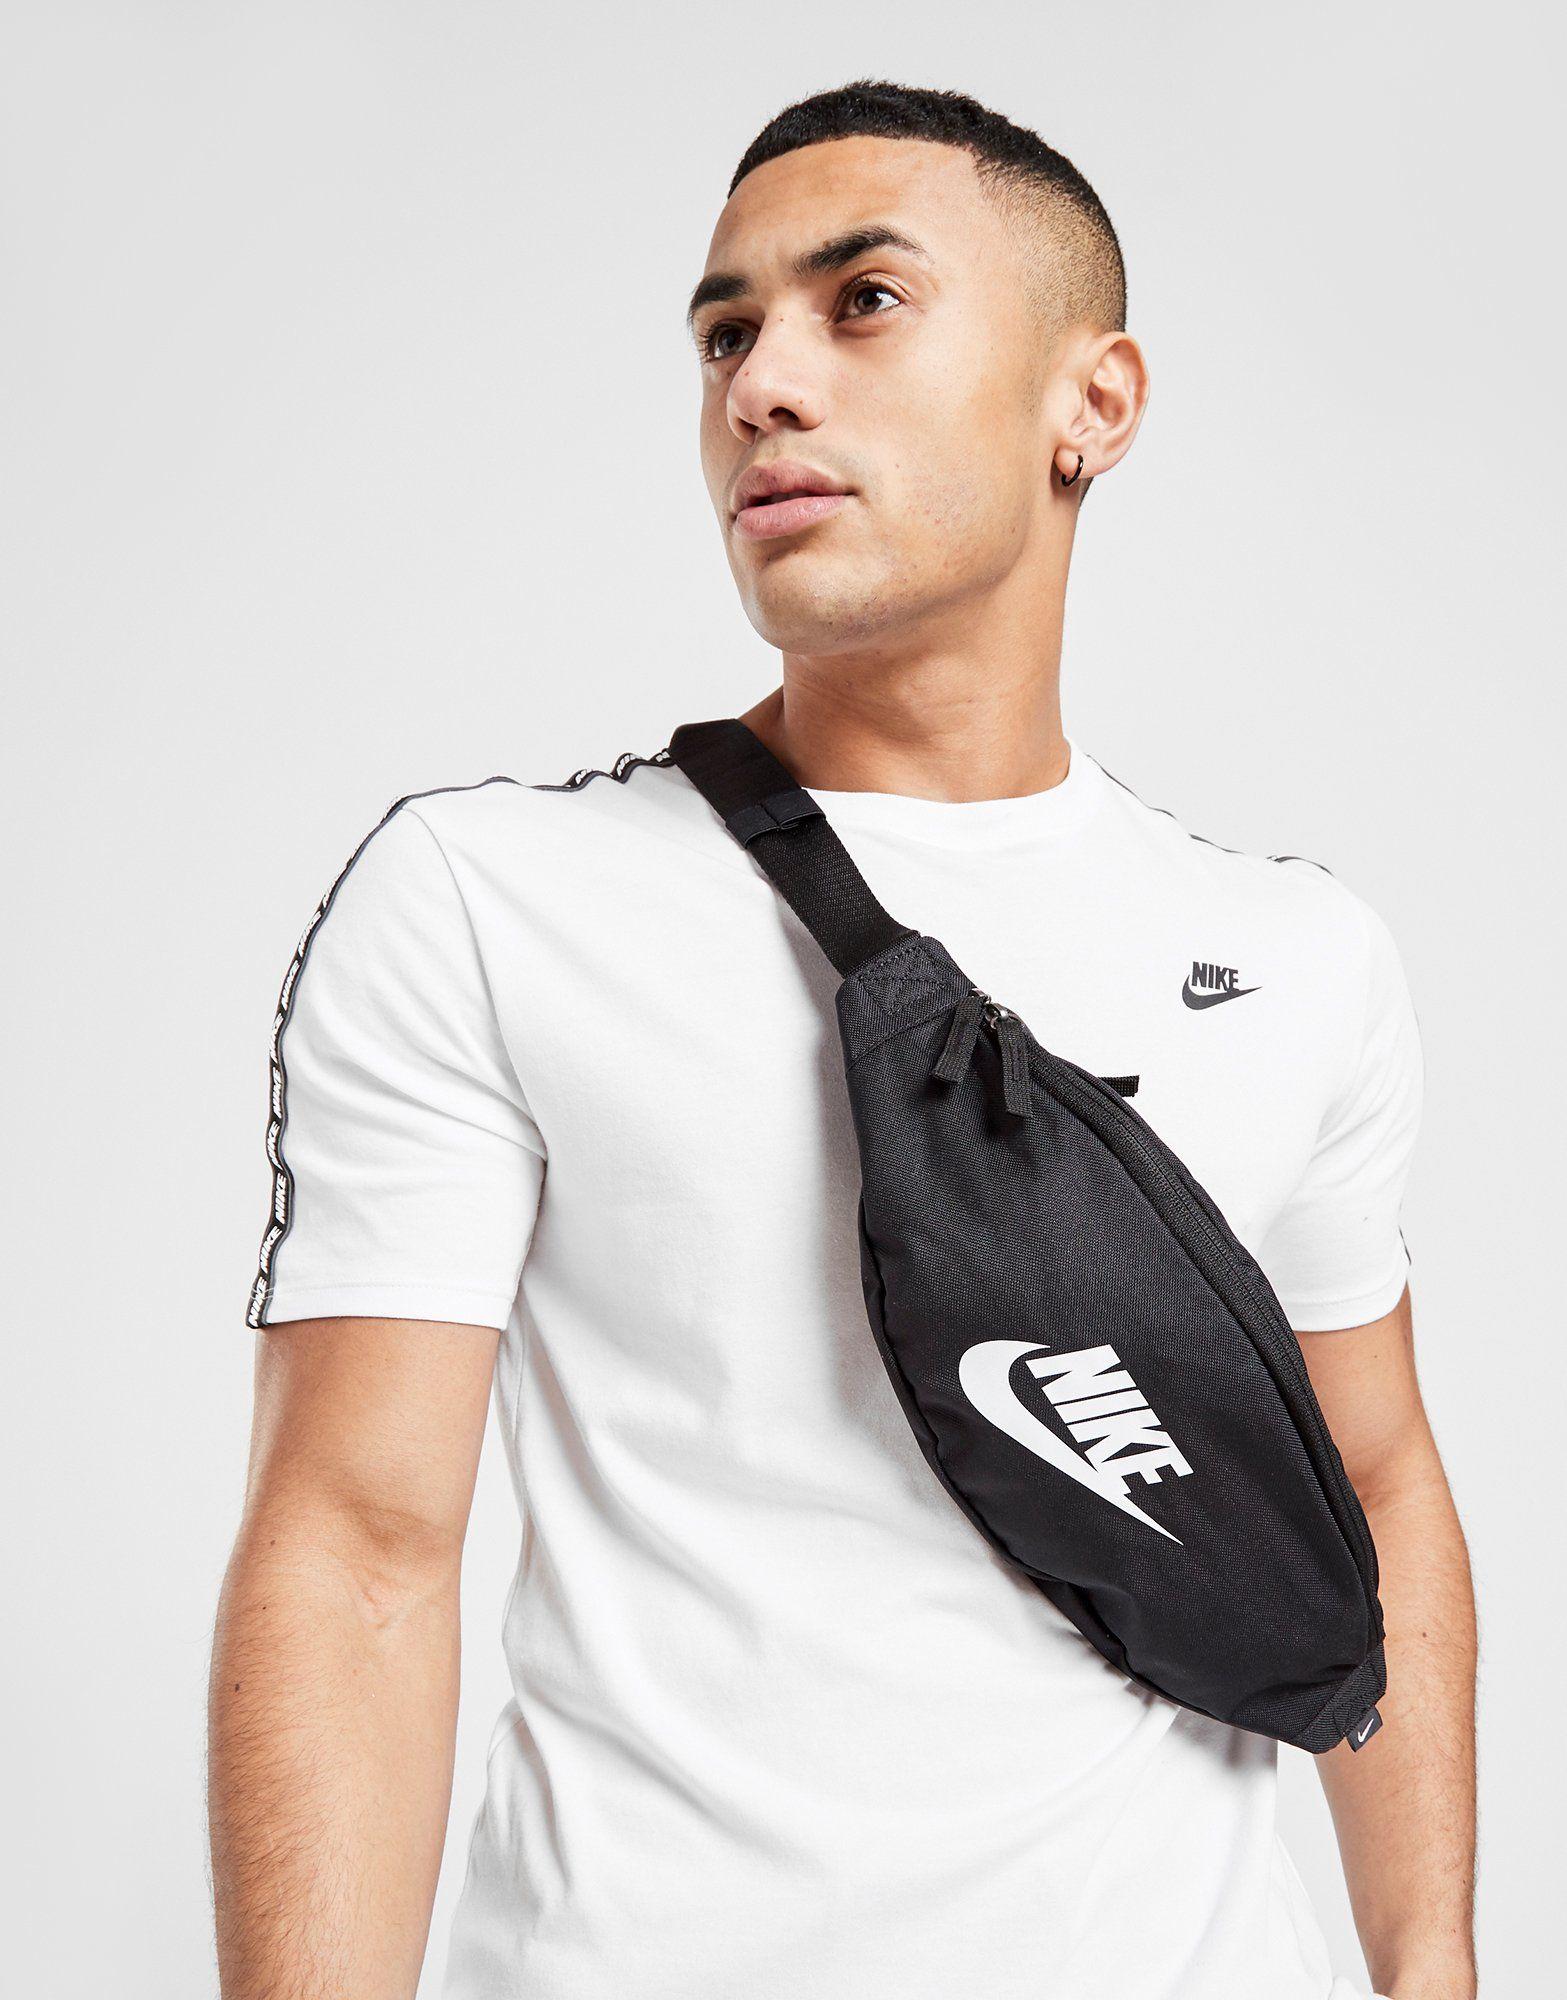 Nike Waist Bag